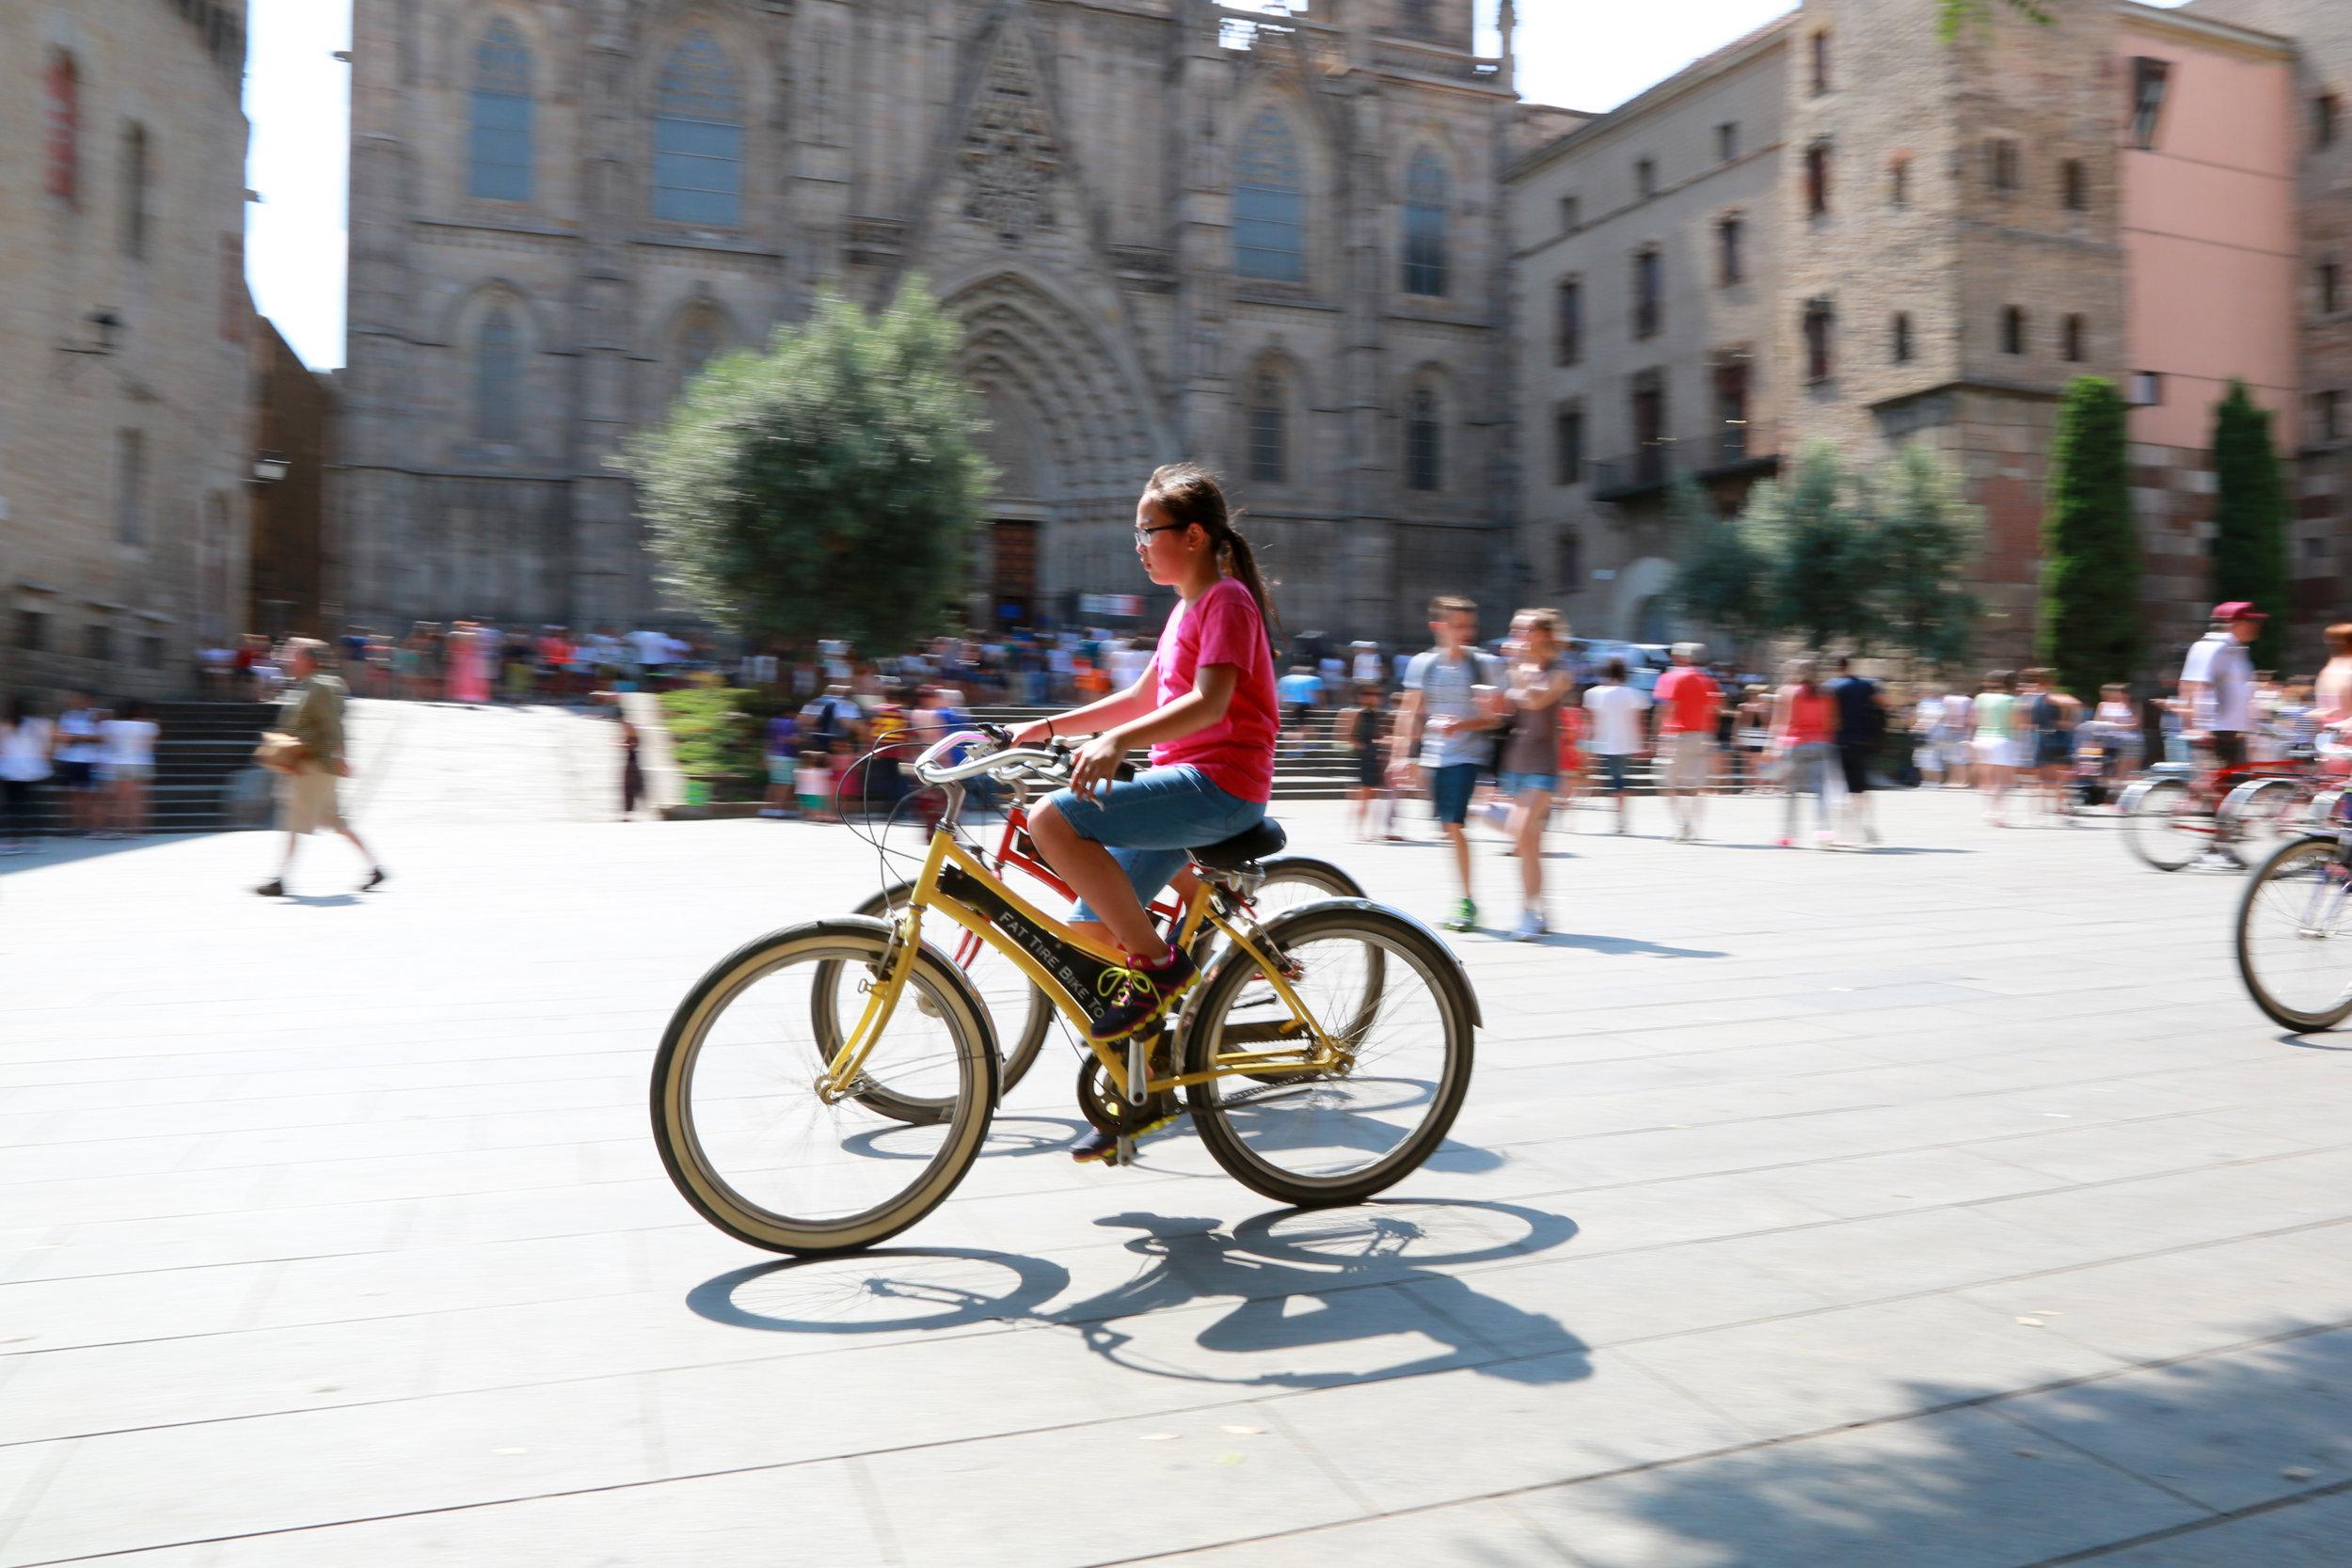 A photo I took in Barcelona, 2014